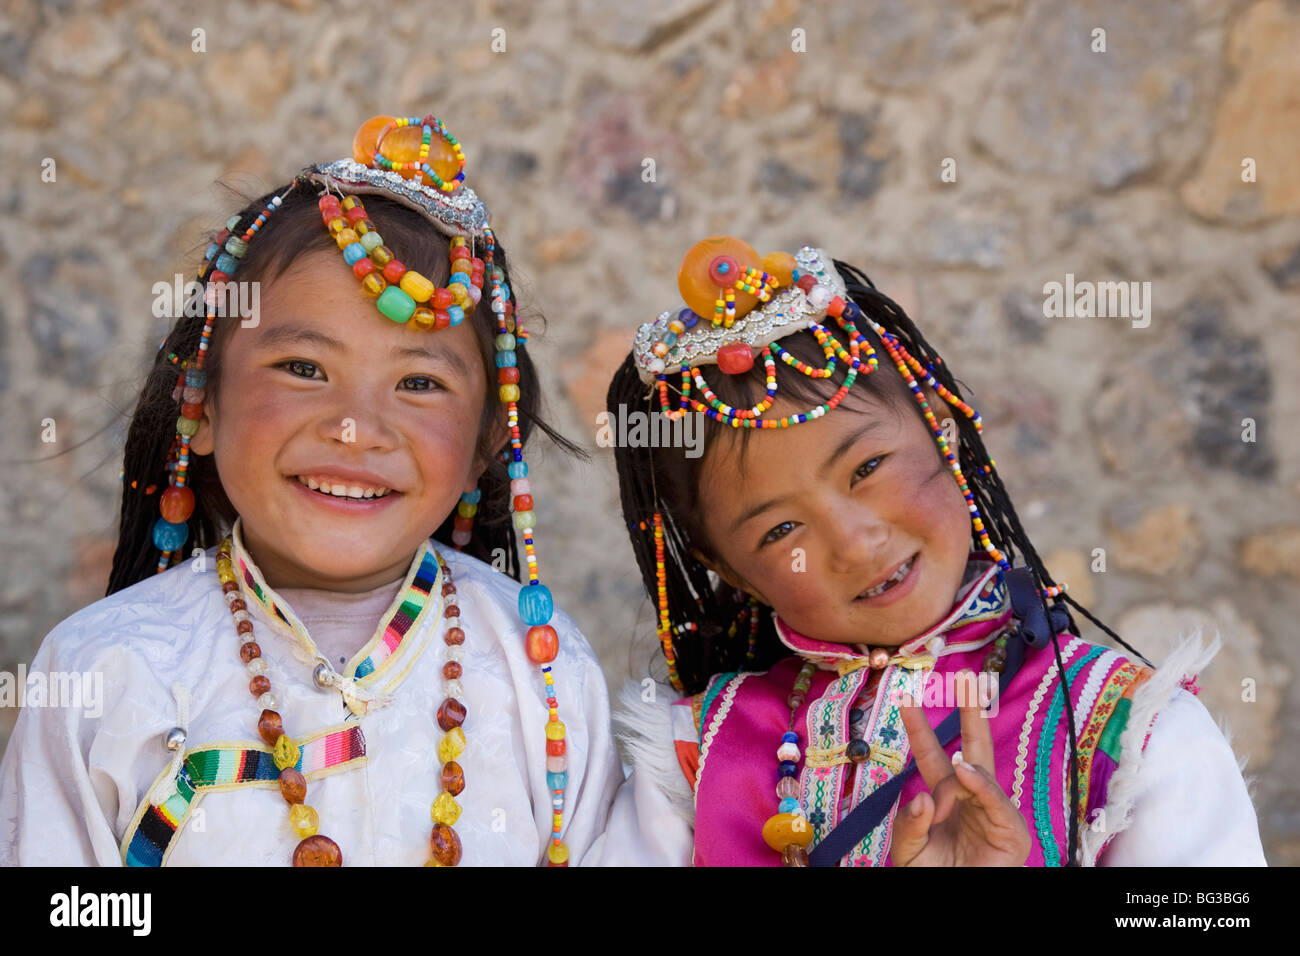 Kunming Minority Groups and Festivals Kunming China, Kunming ...